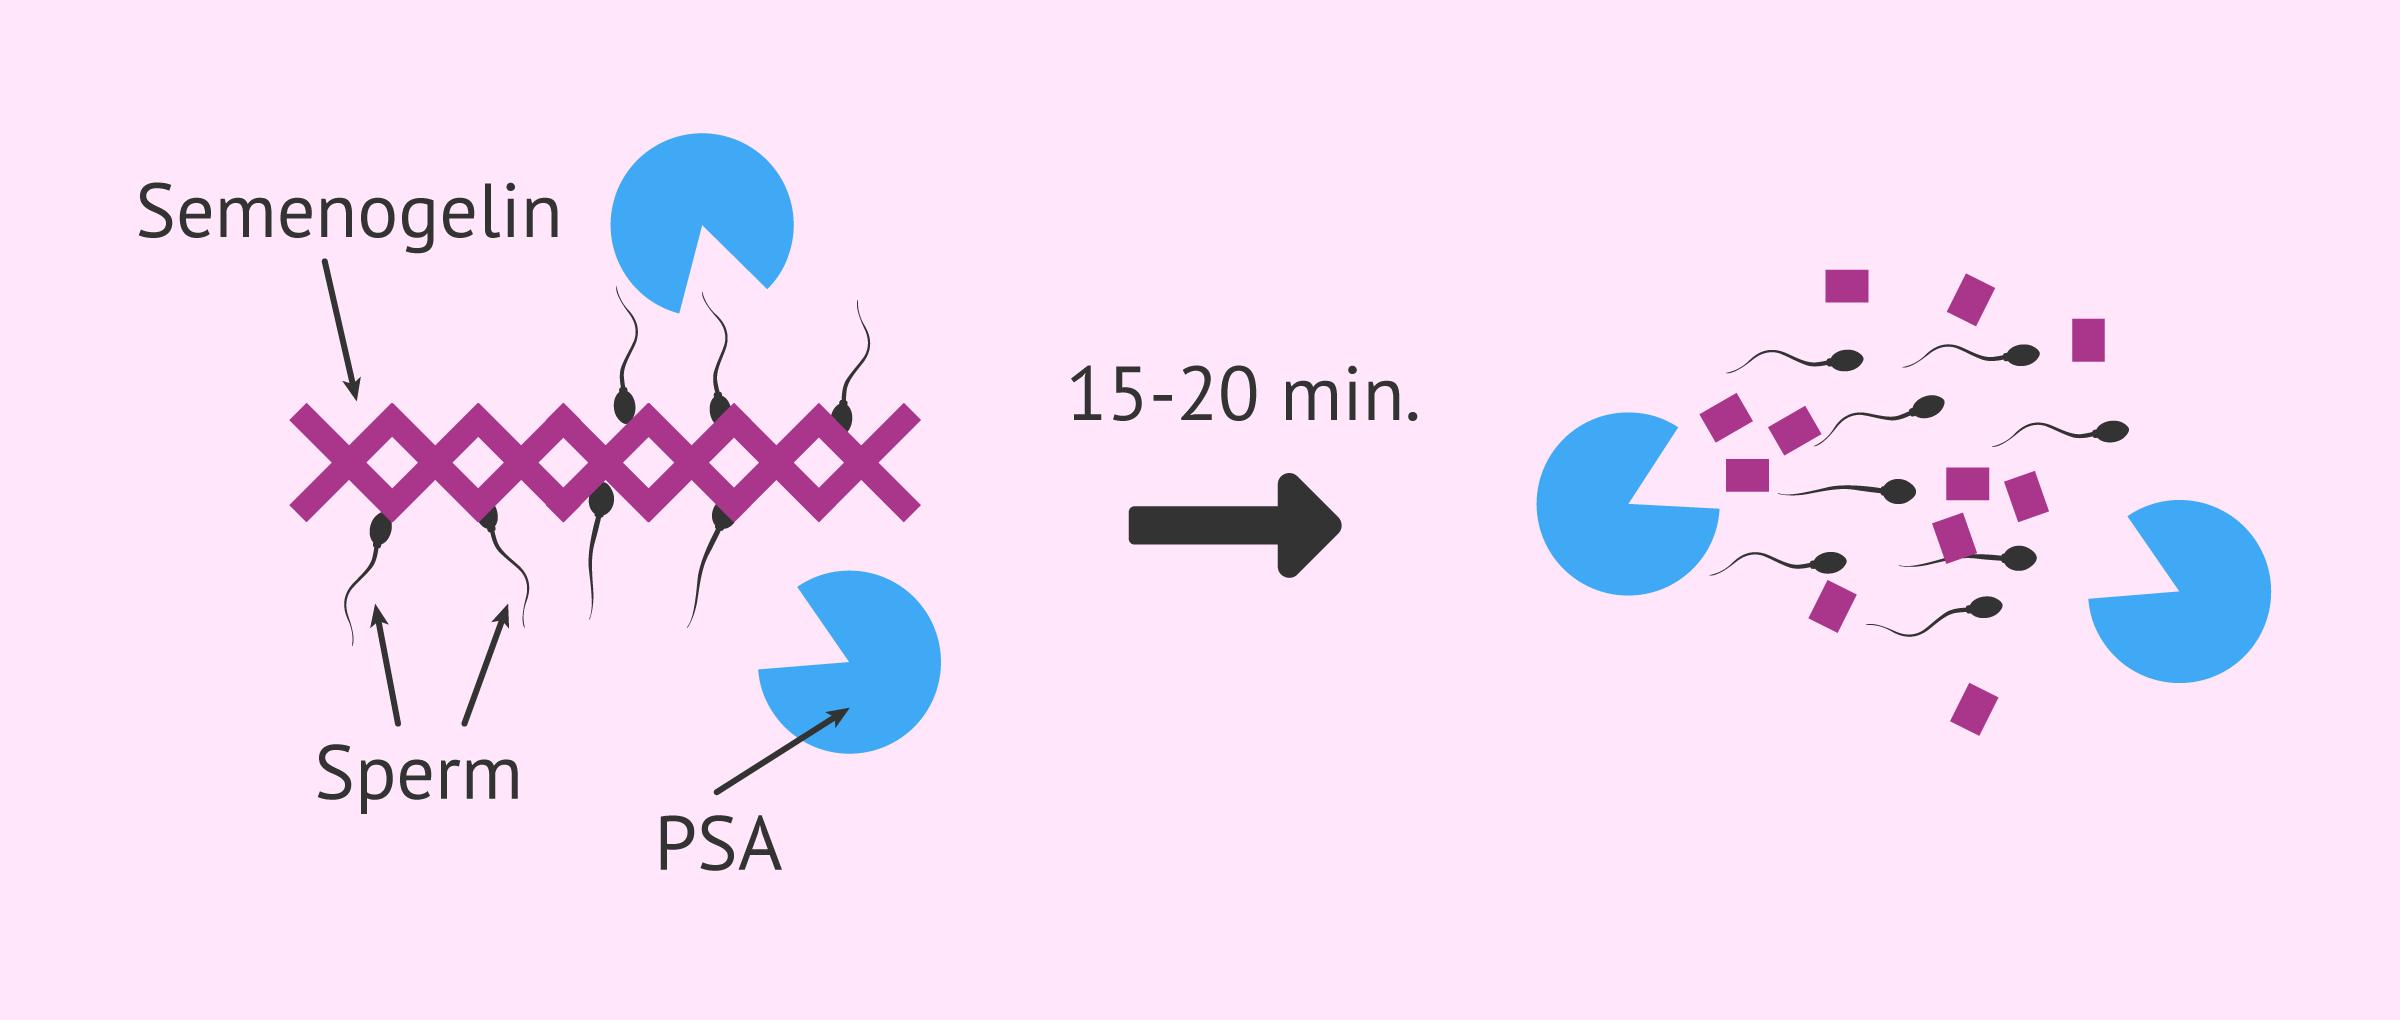 Semen density and liquefaction